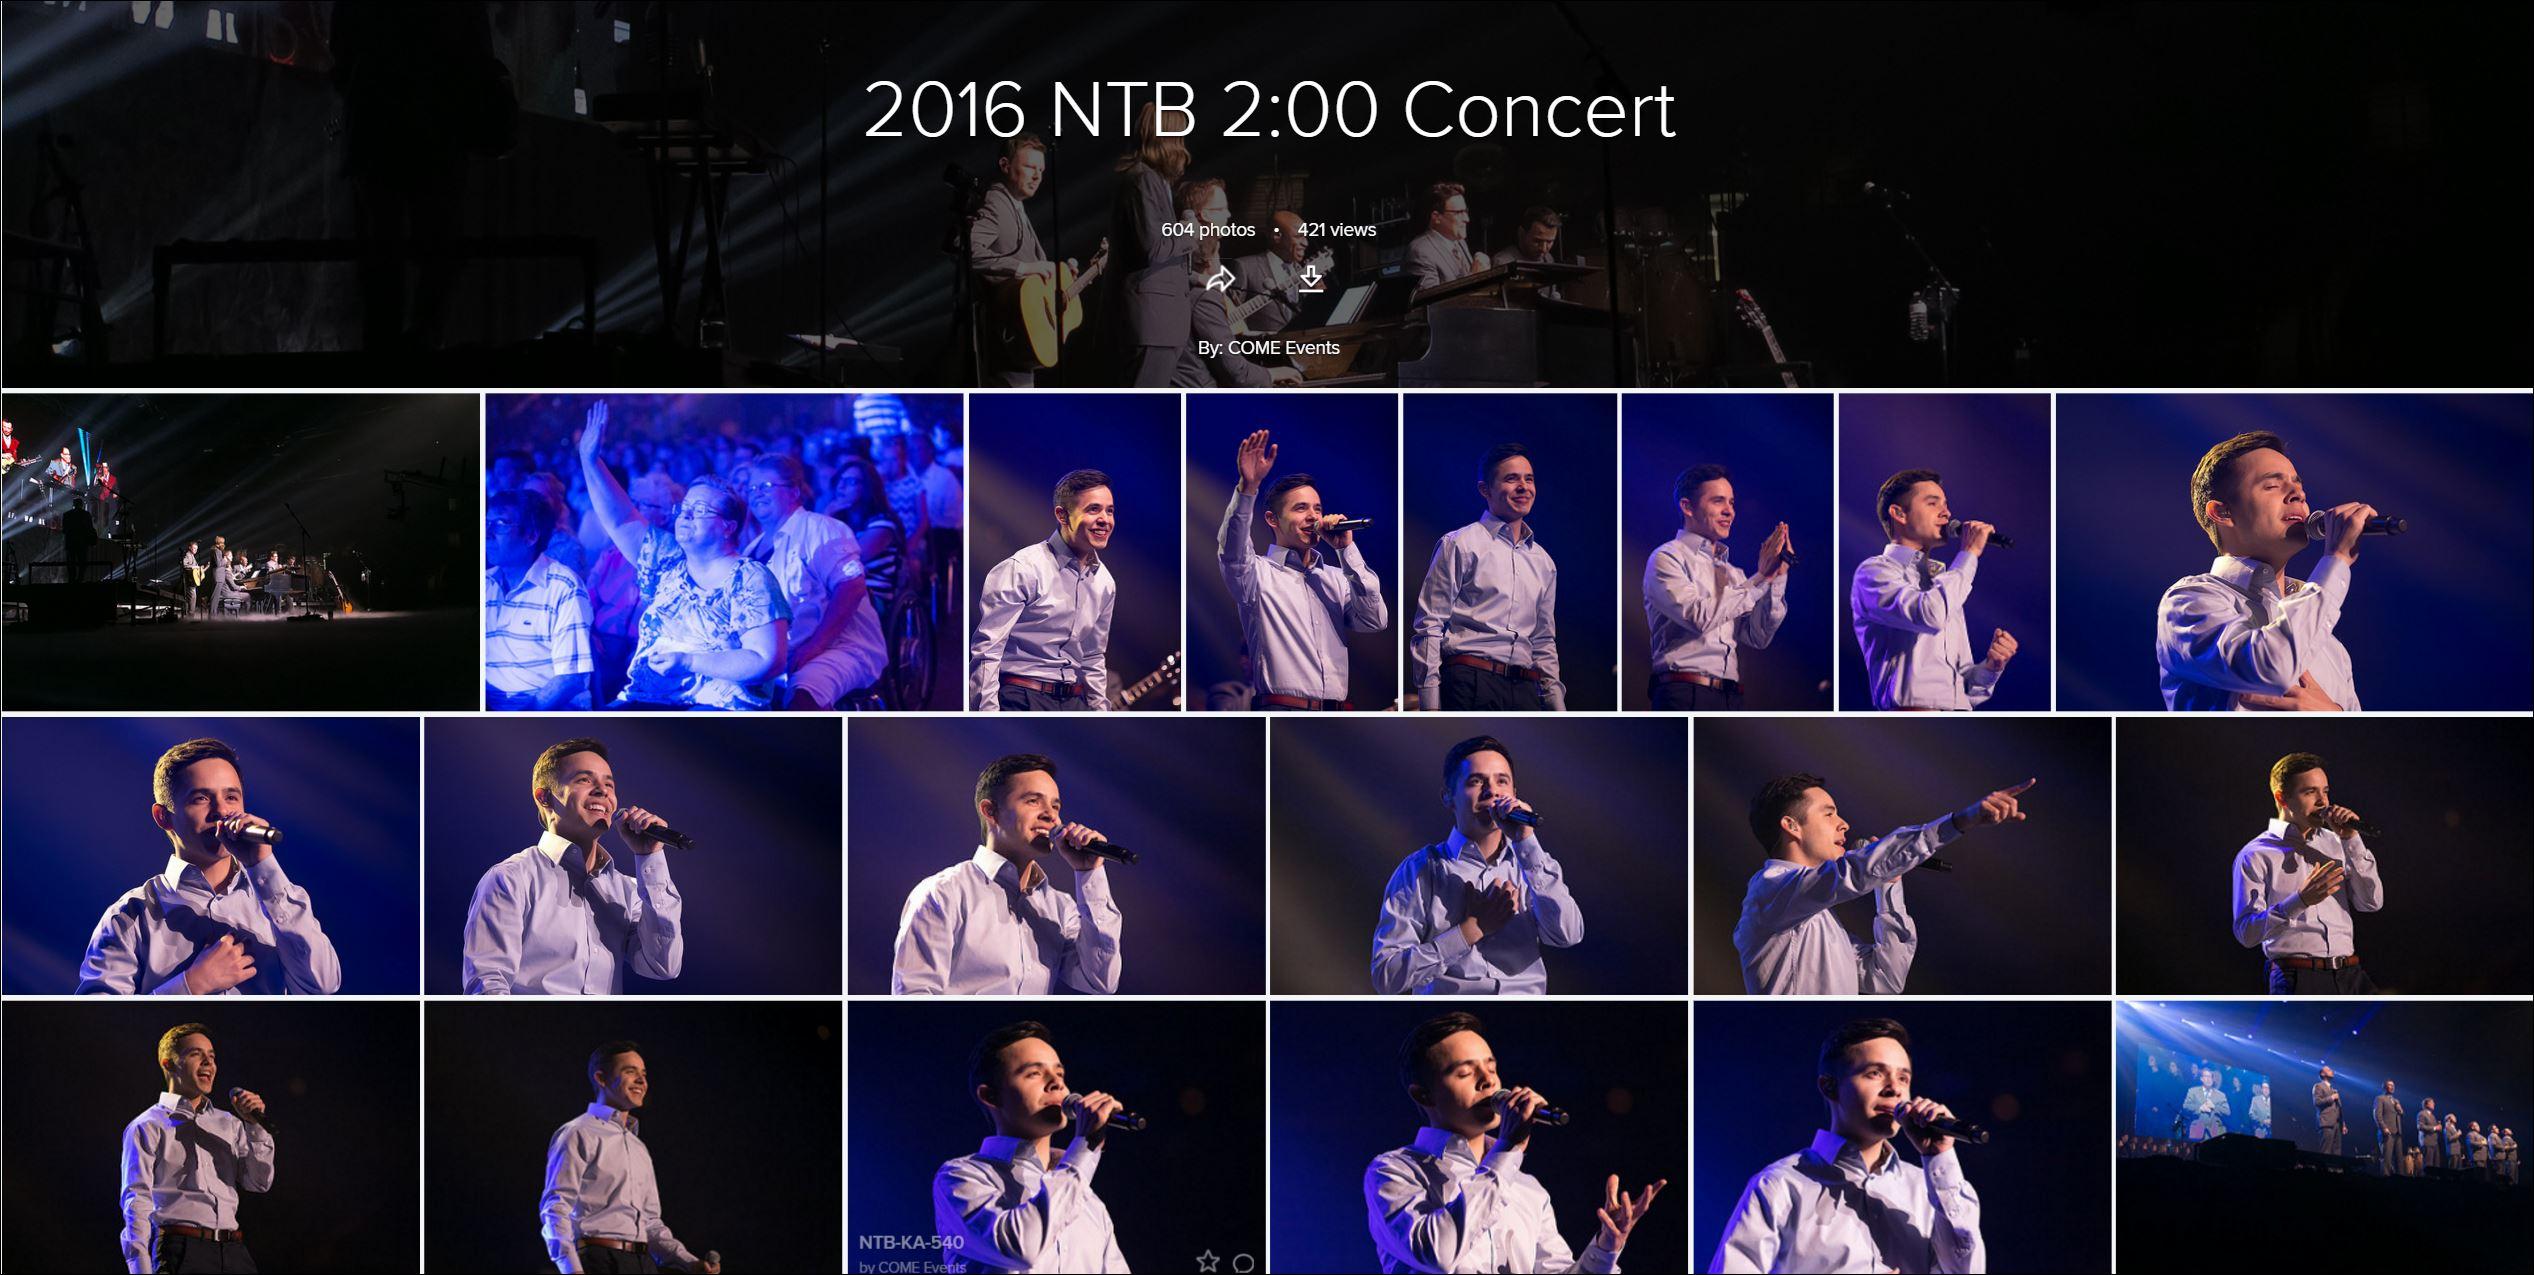 2016 NTB konser 02:00